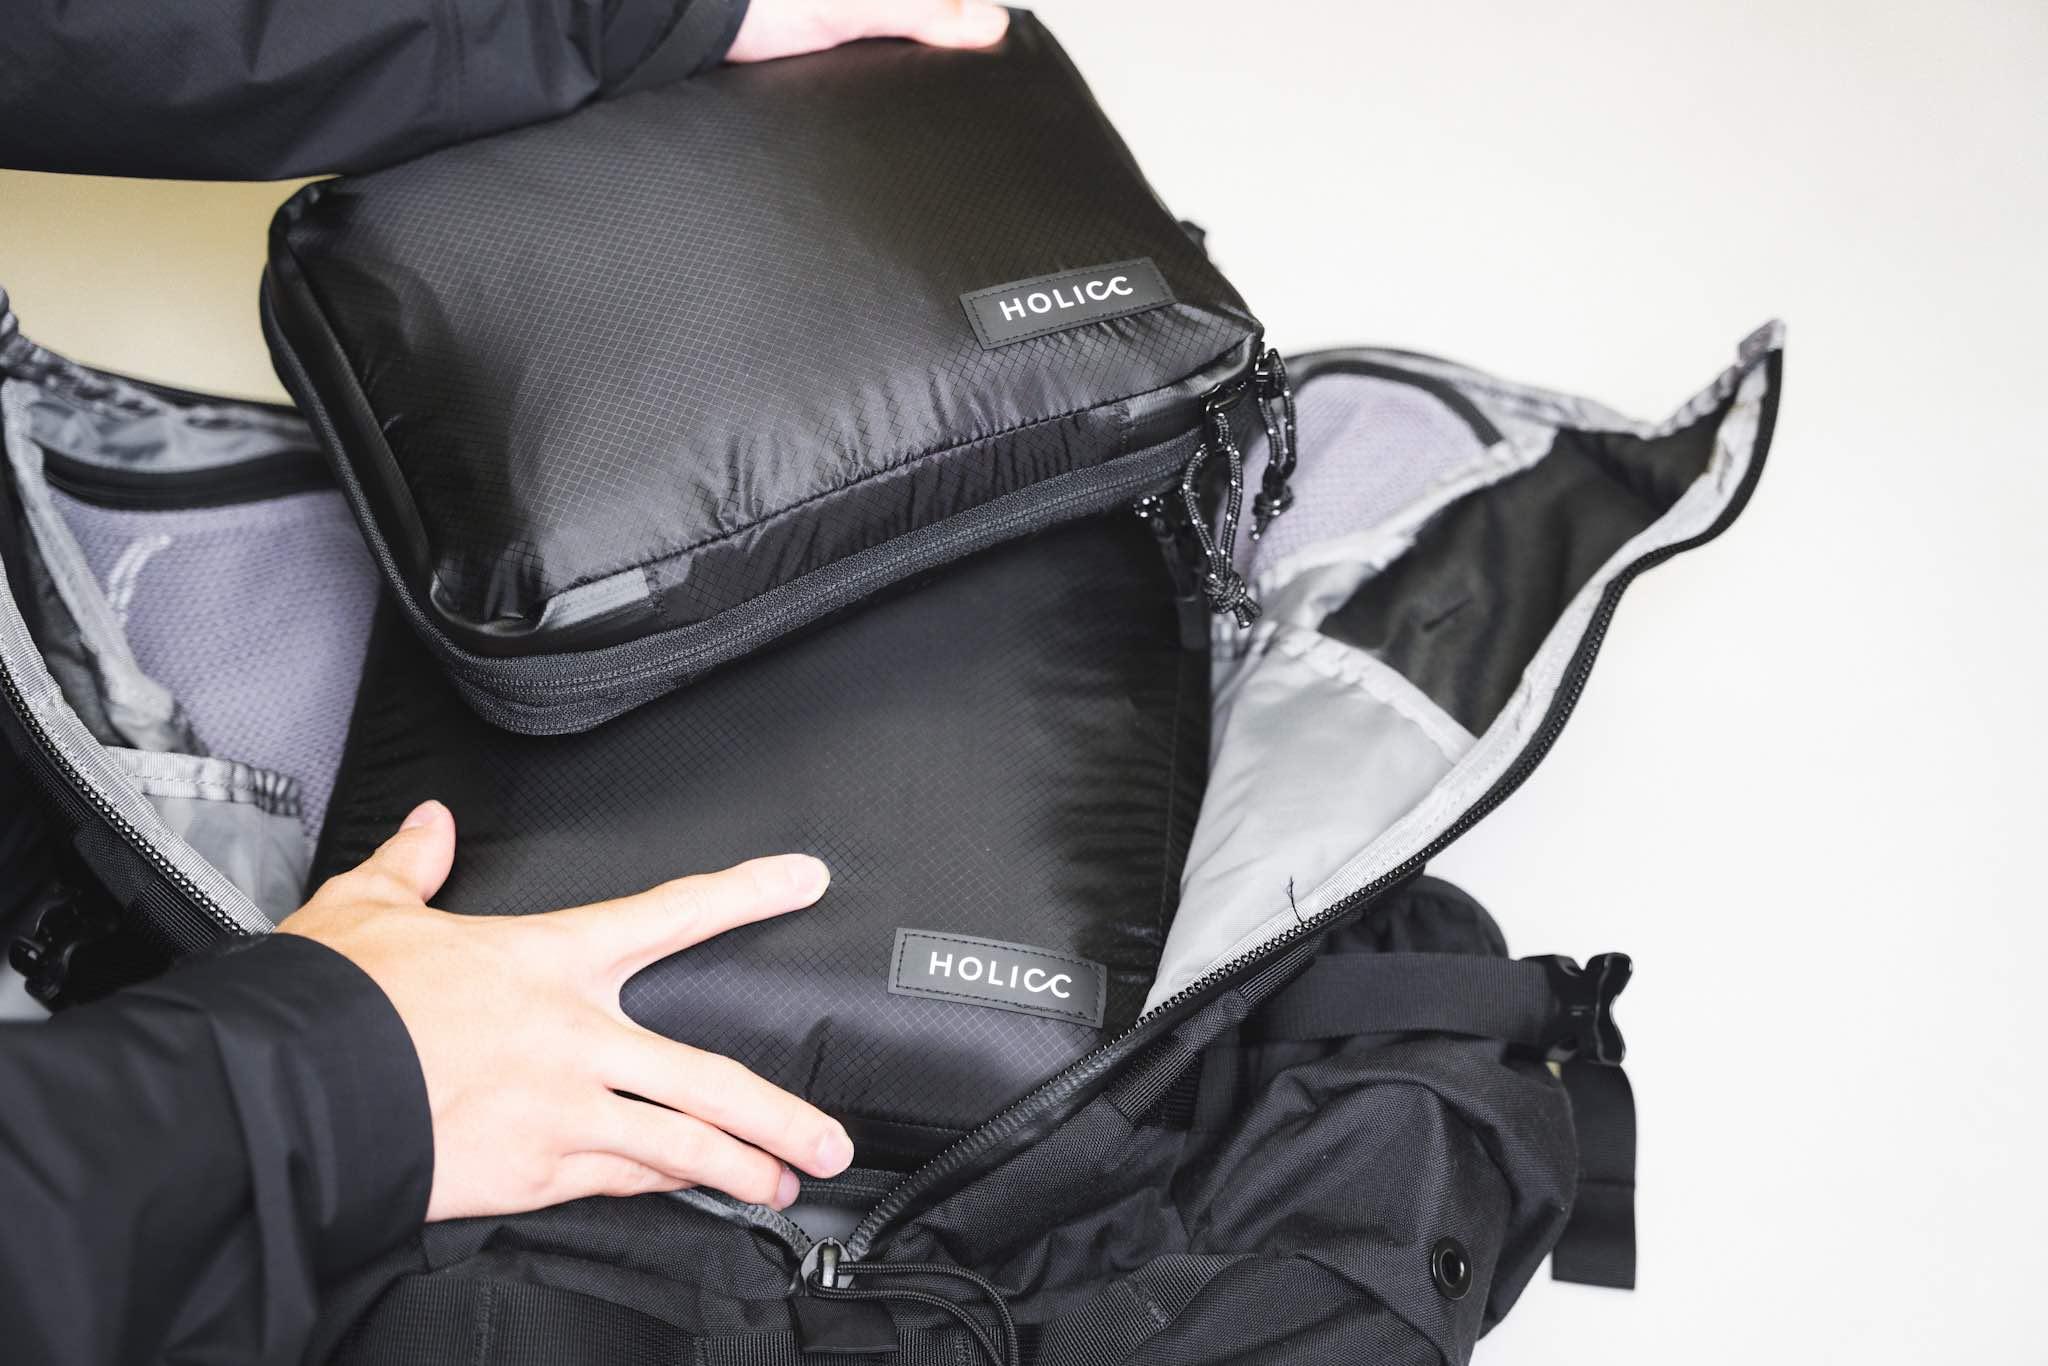 HOLICC PackBag 超実用的なのにモチベも上げてくれる逸品